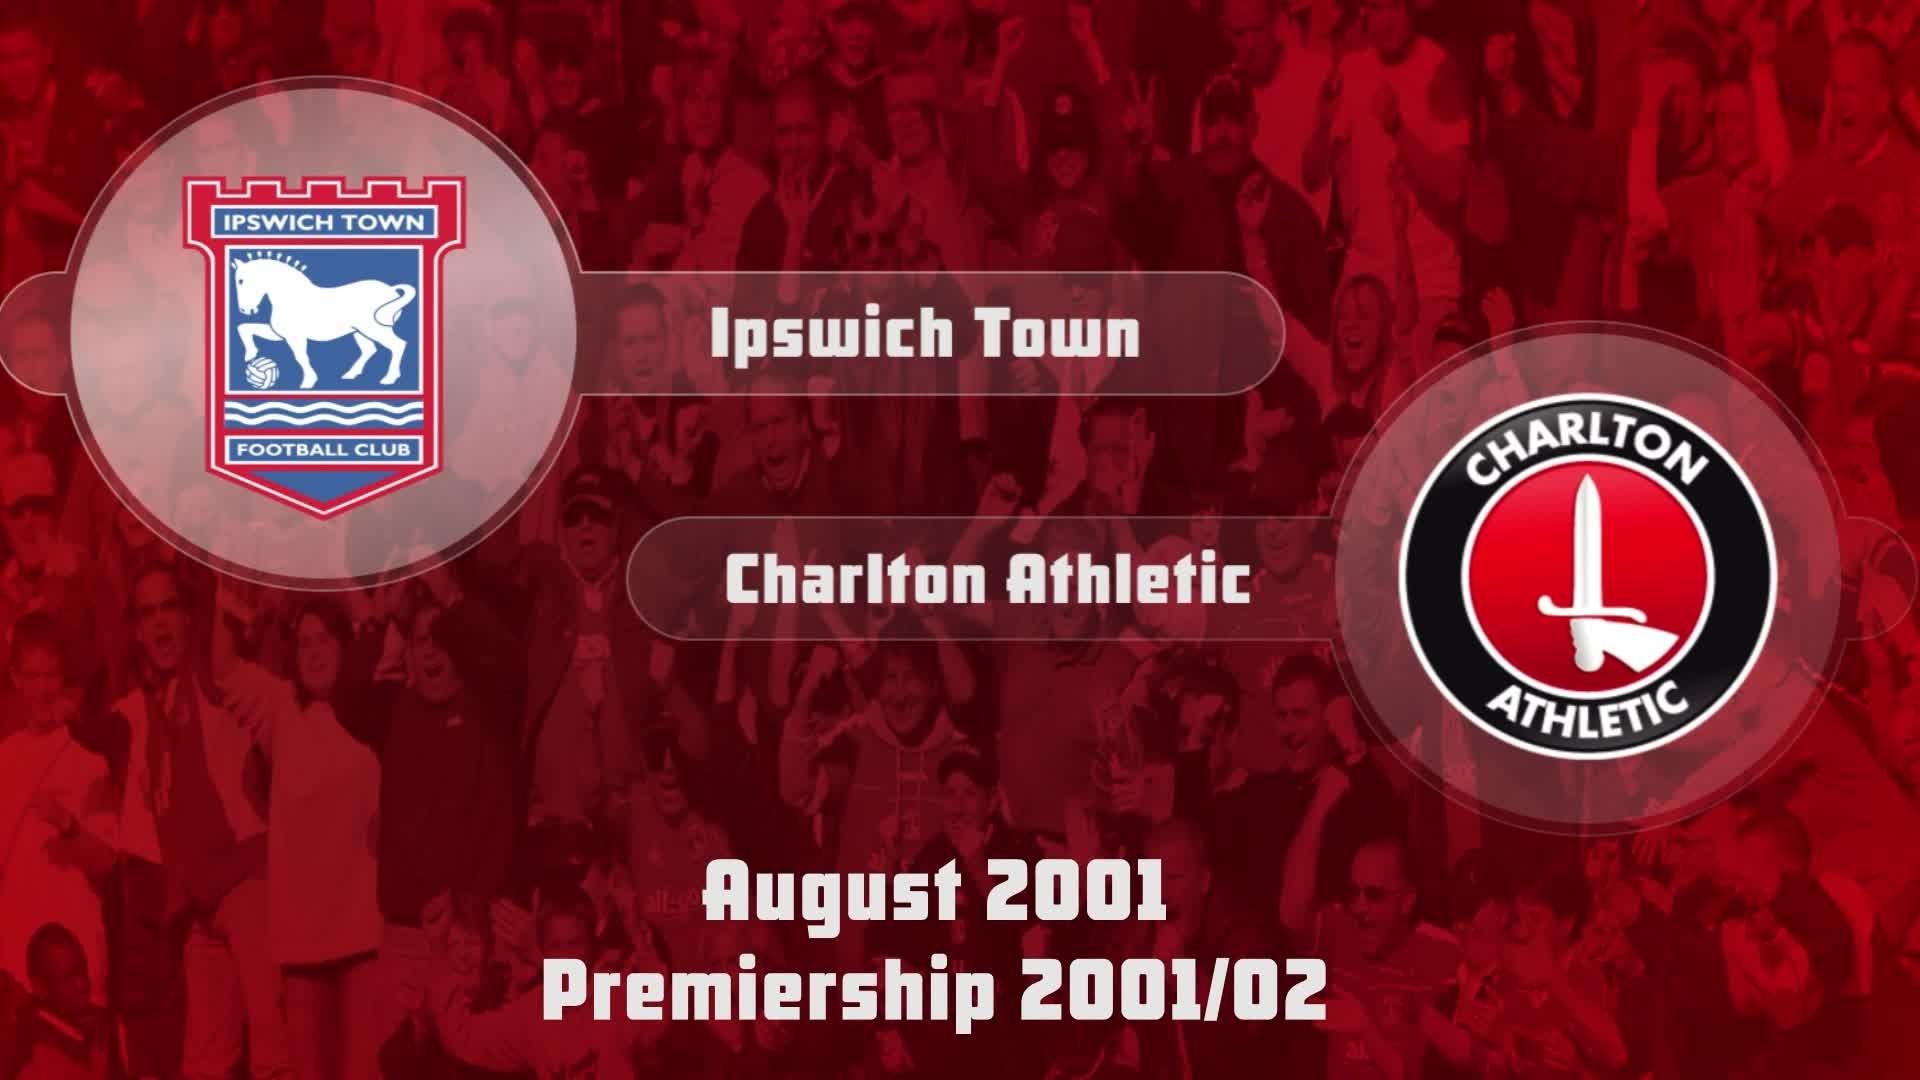 02 HIGHLIGHTS | Ipswich Town 0 Charlton 1 (Aug 2001)